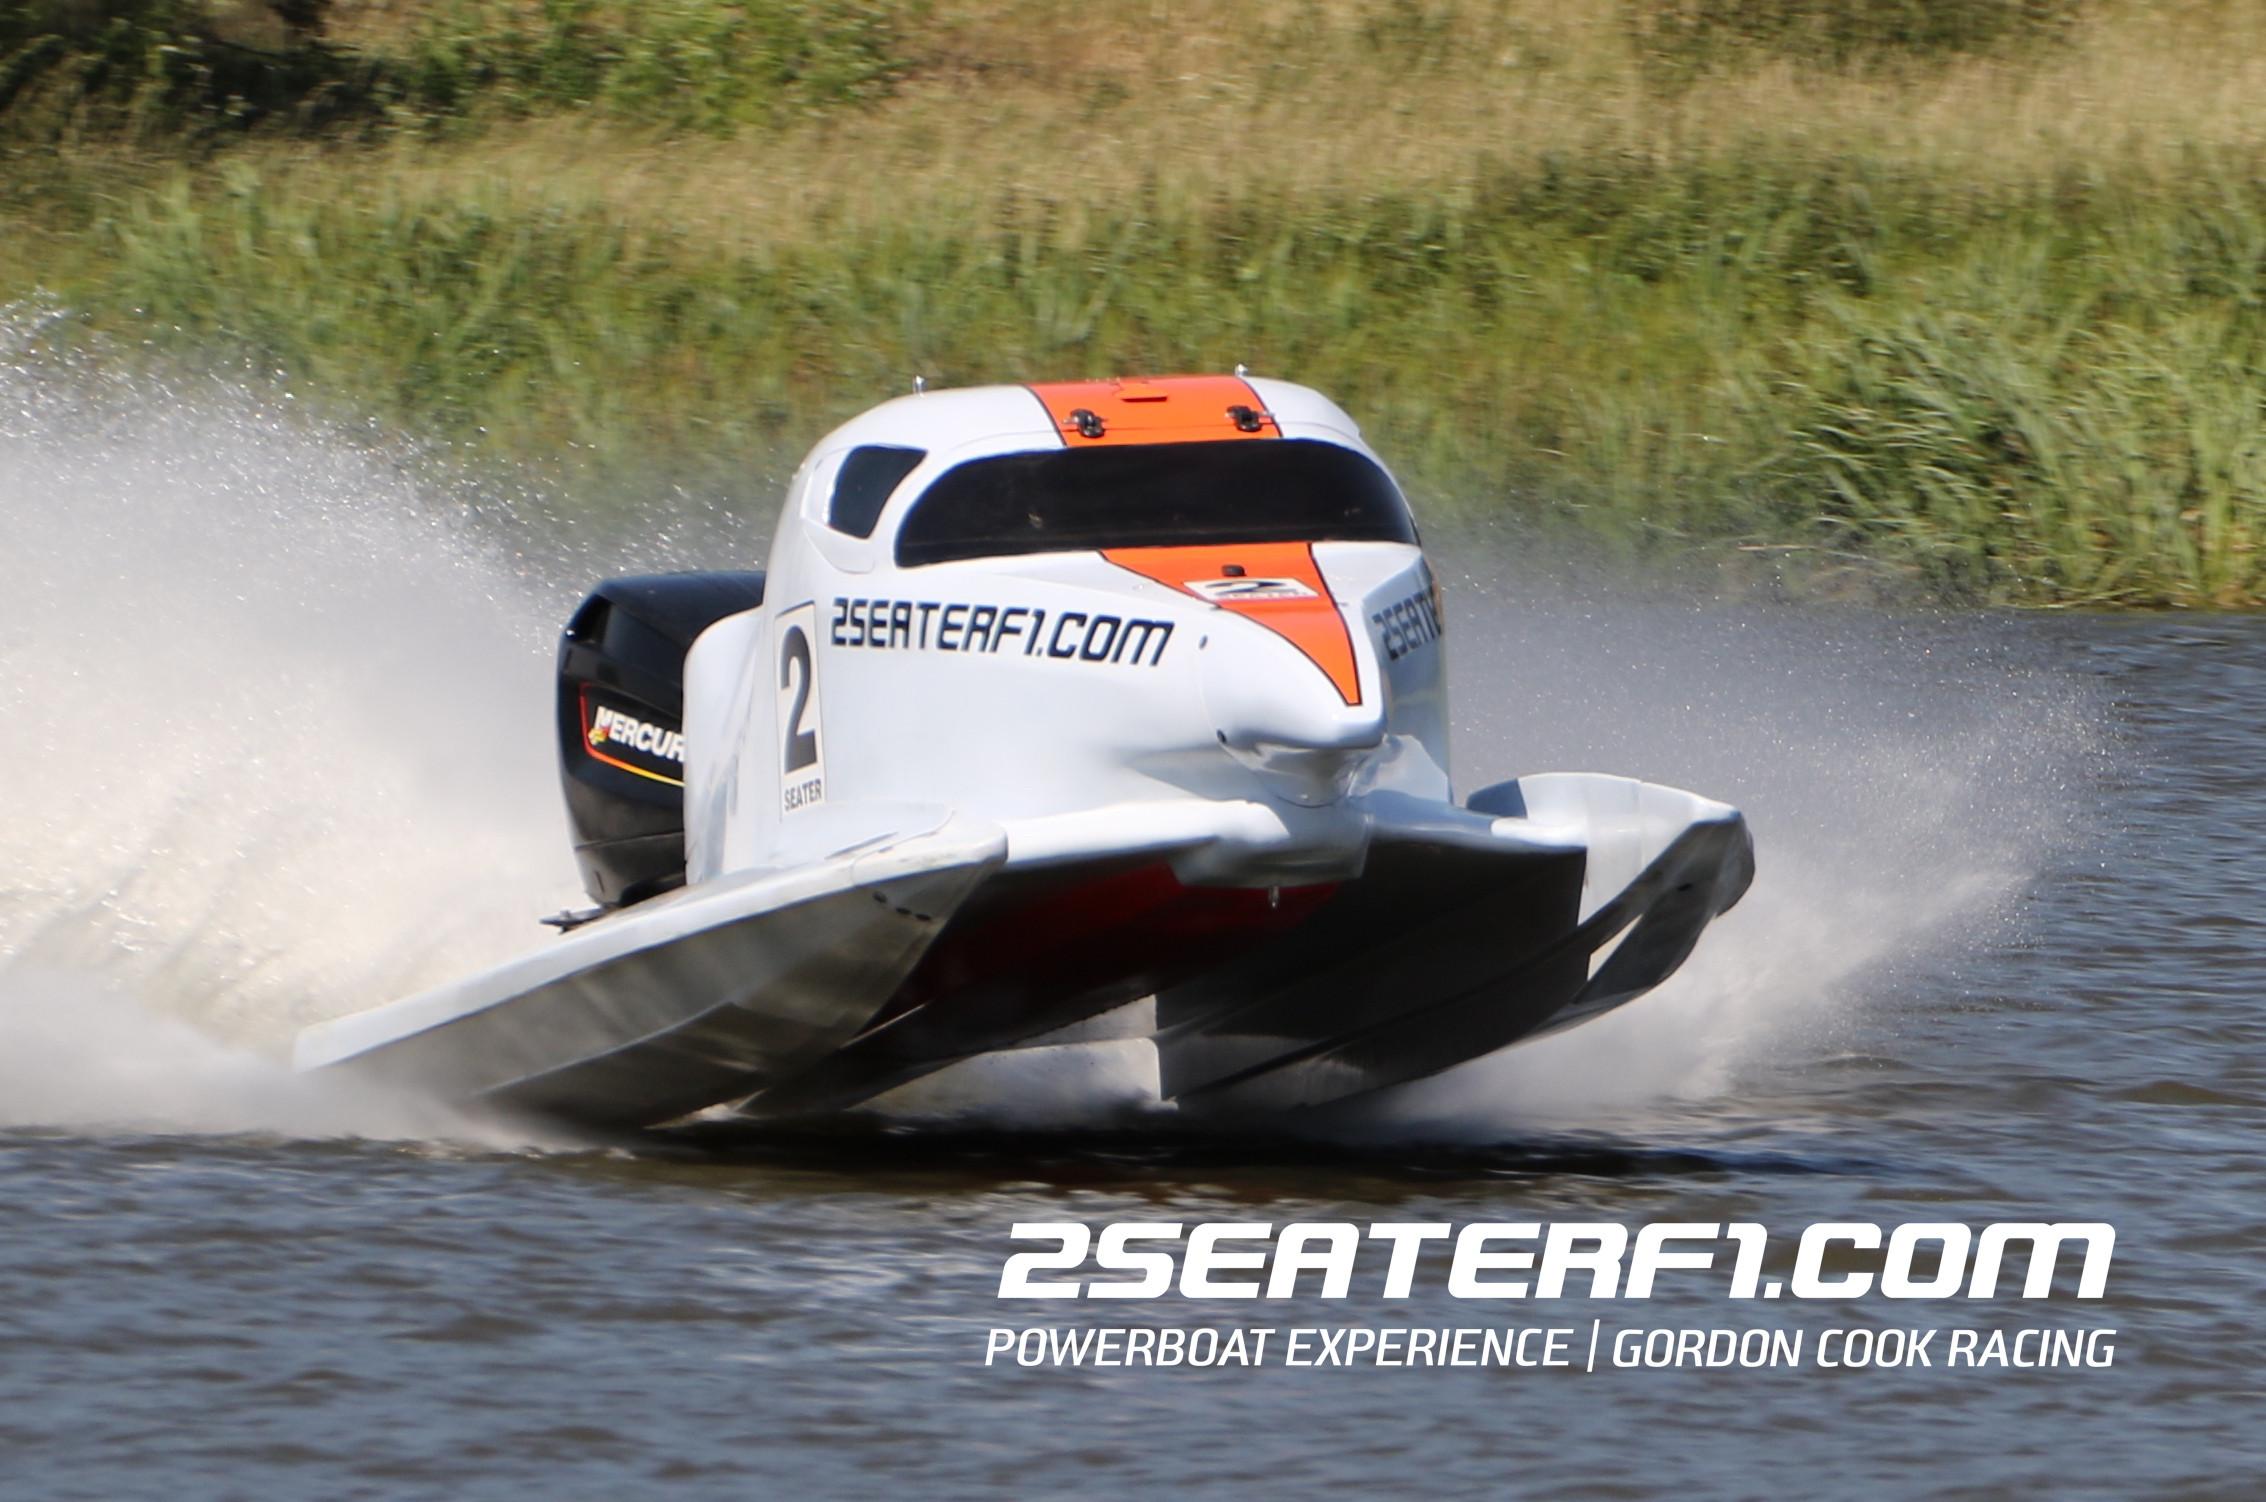 High Speed 2 Seater F1 Thrill Rides